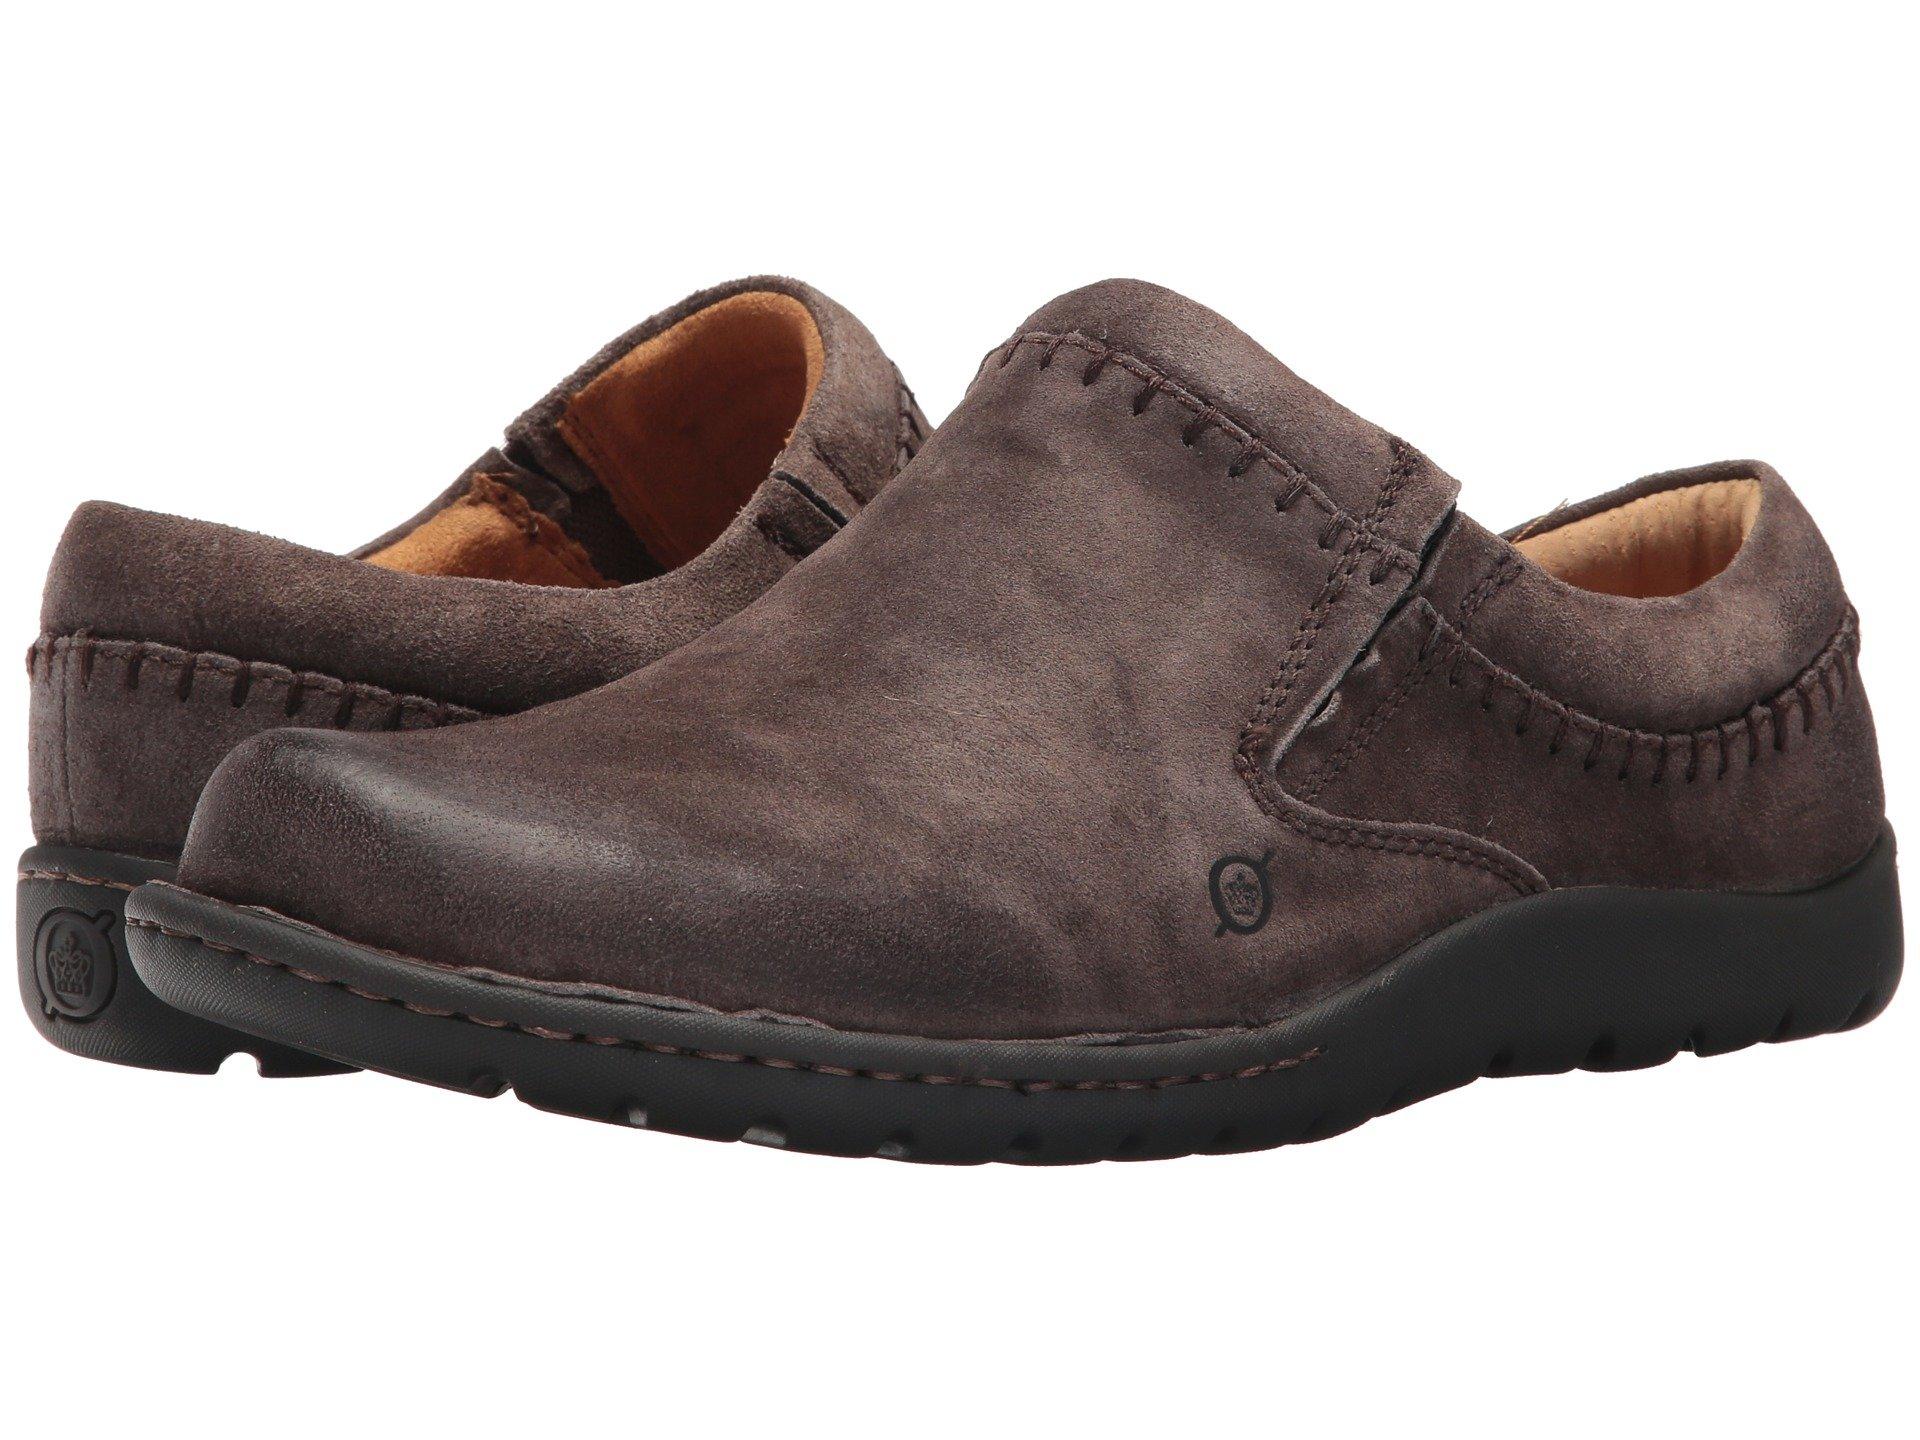 c70cc59ebe92c Men s Born Shoes + FREE SHIPPING